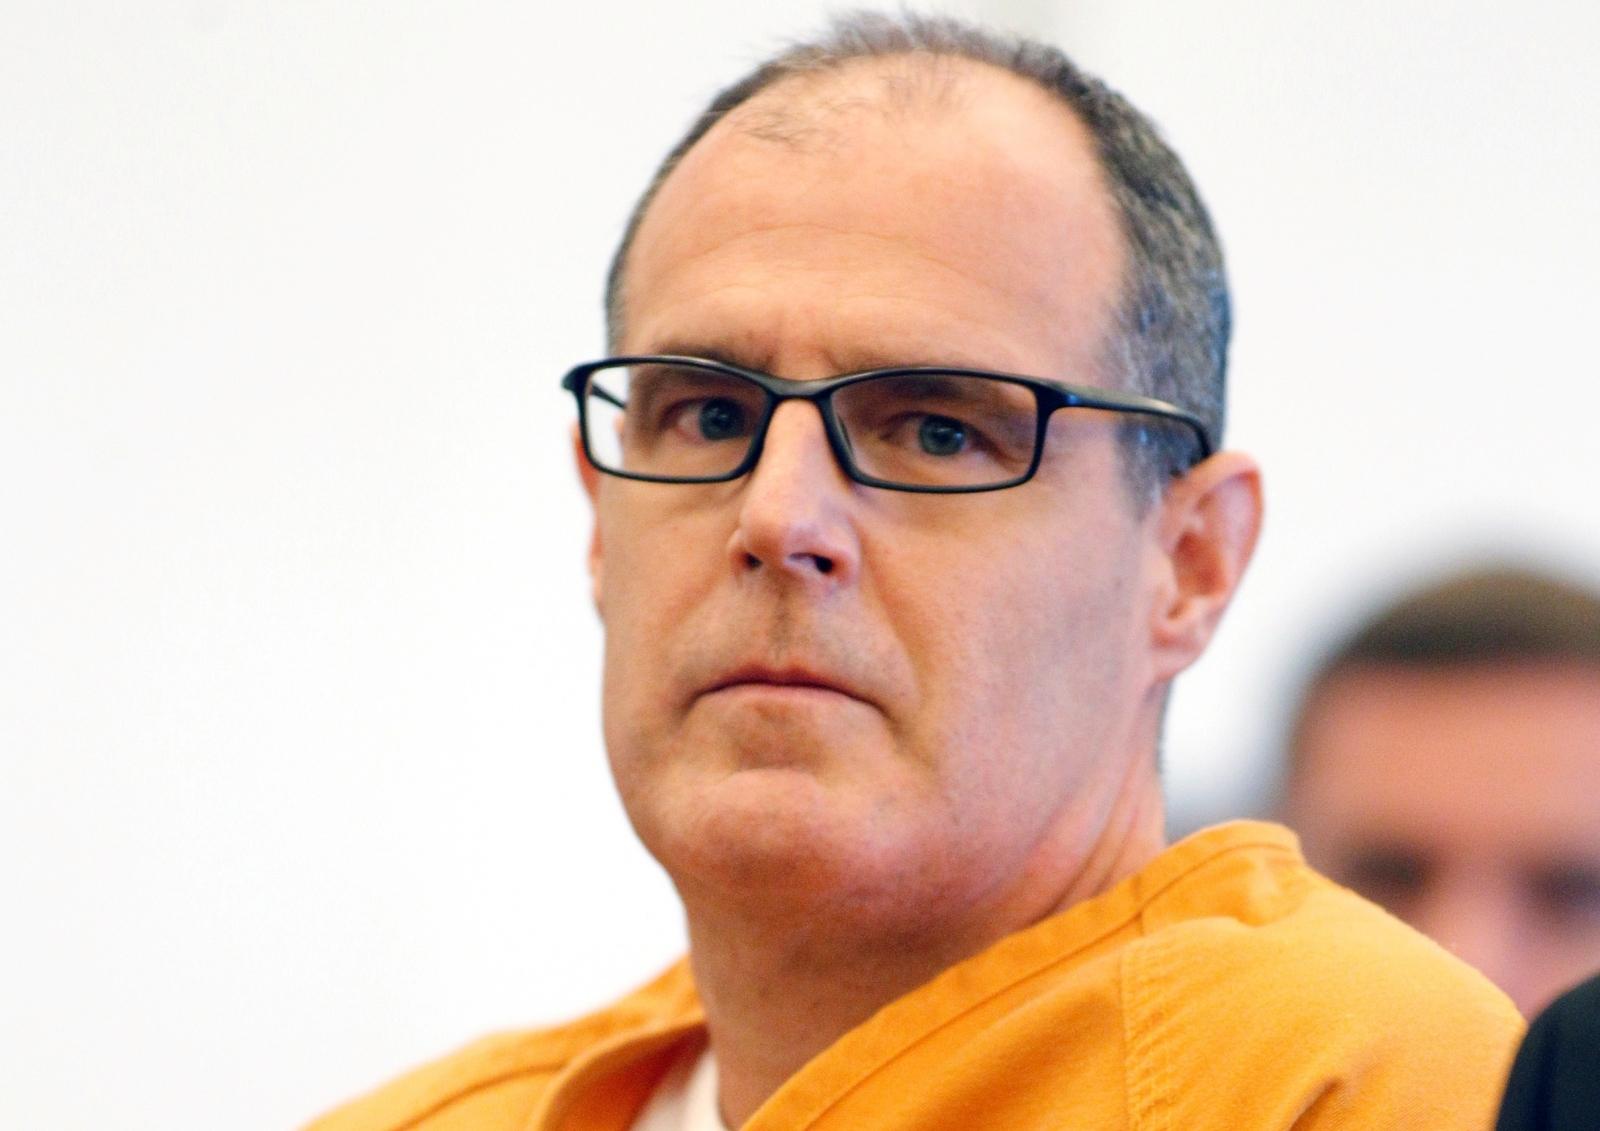 Scott Dekraai California hair salon killer